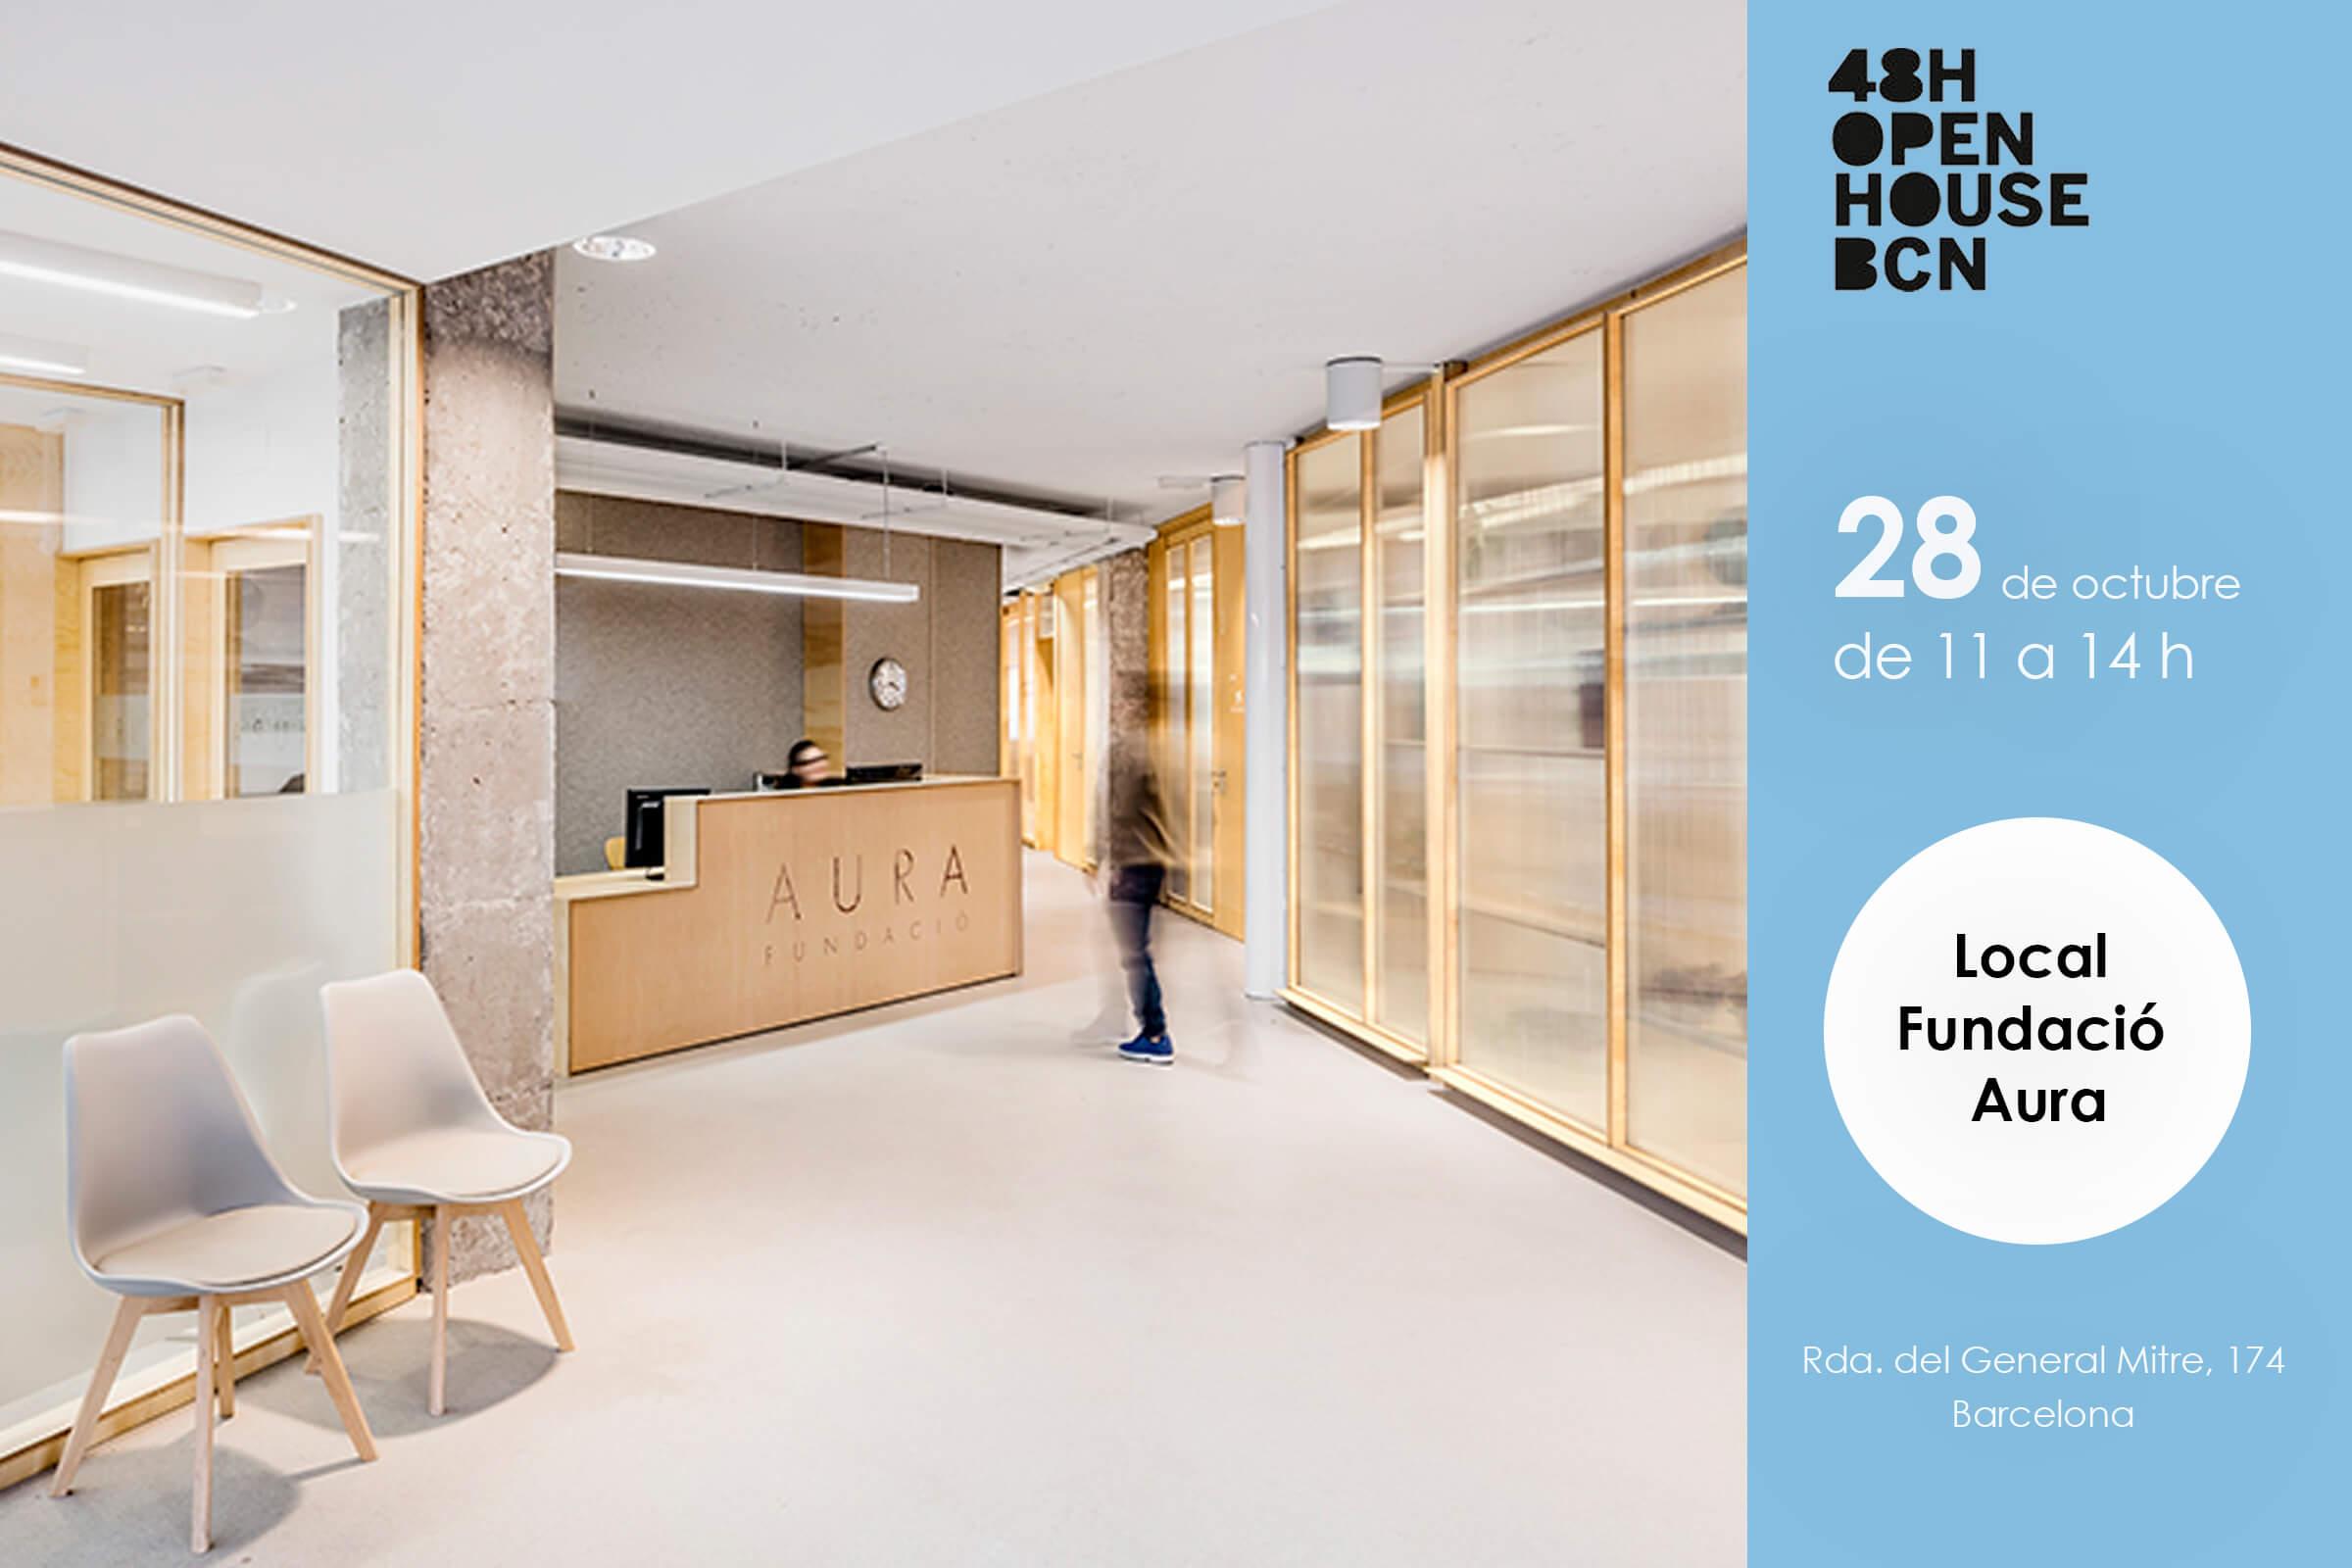 48h open house bcn Aura fundació